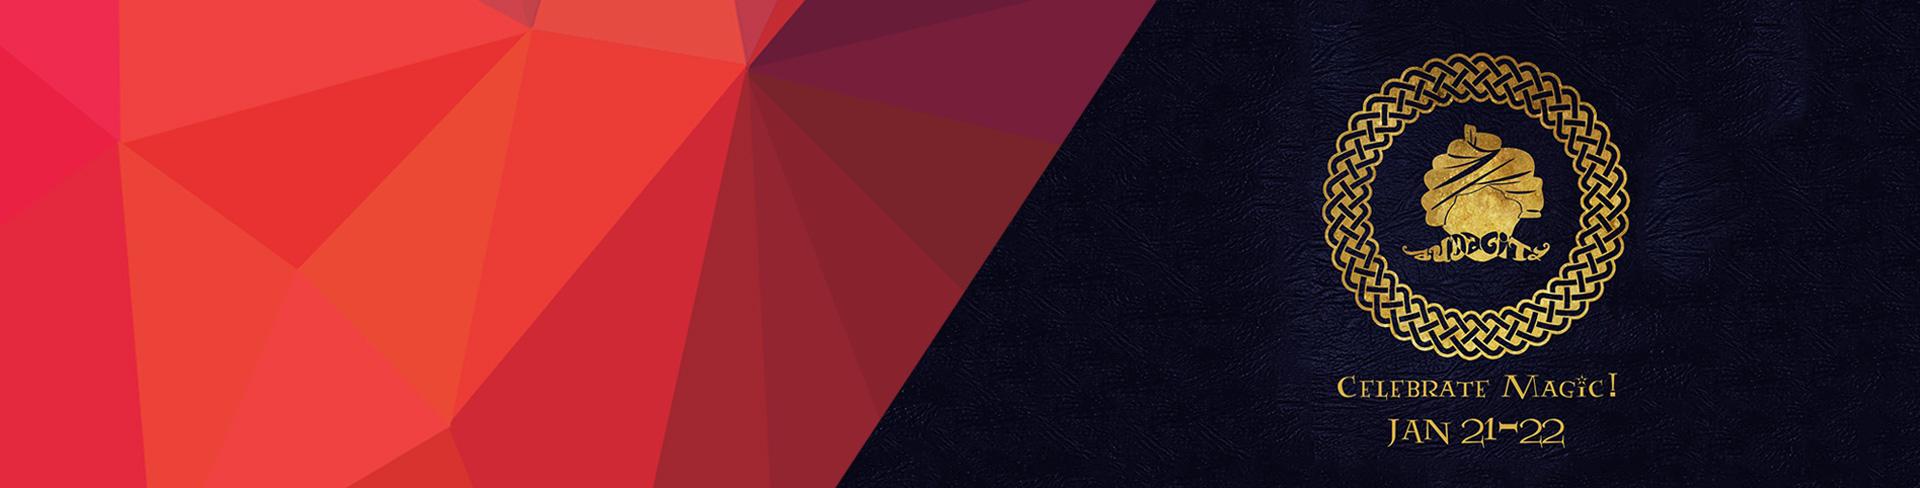 audacity-2017